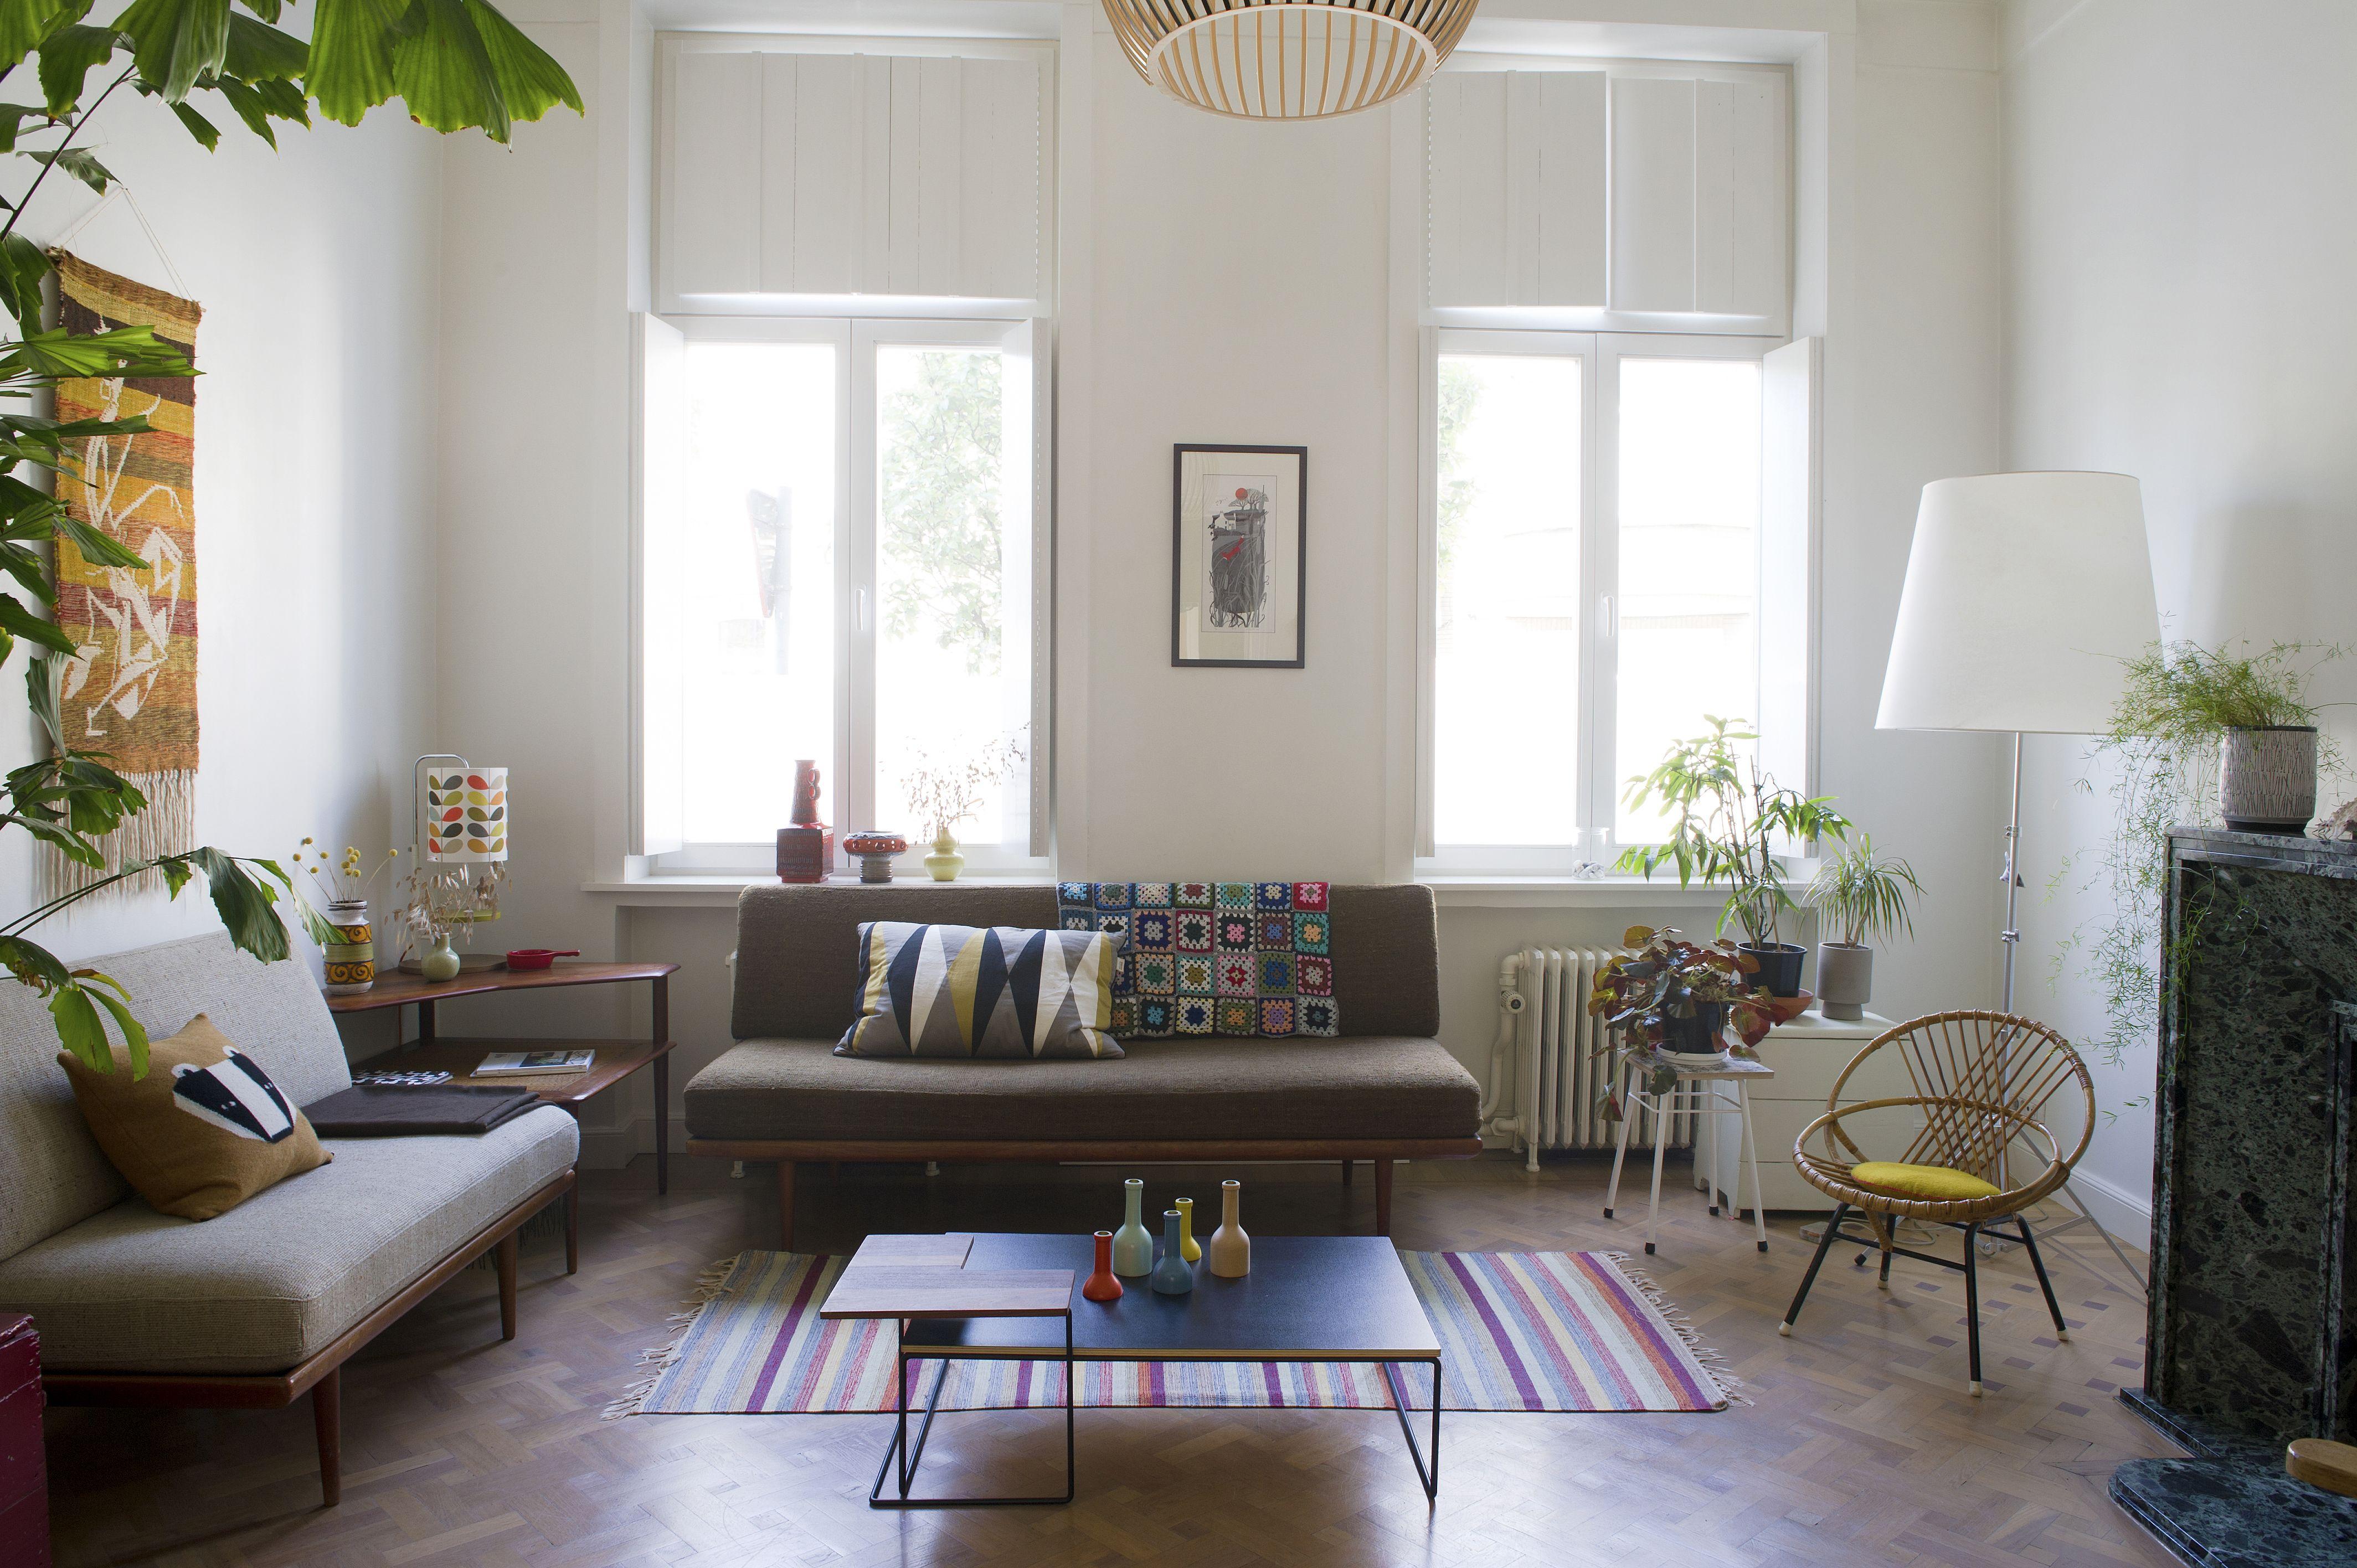 Basic woonkamer met kleurrijke accessoires | Basic living room with ...